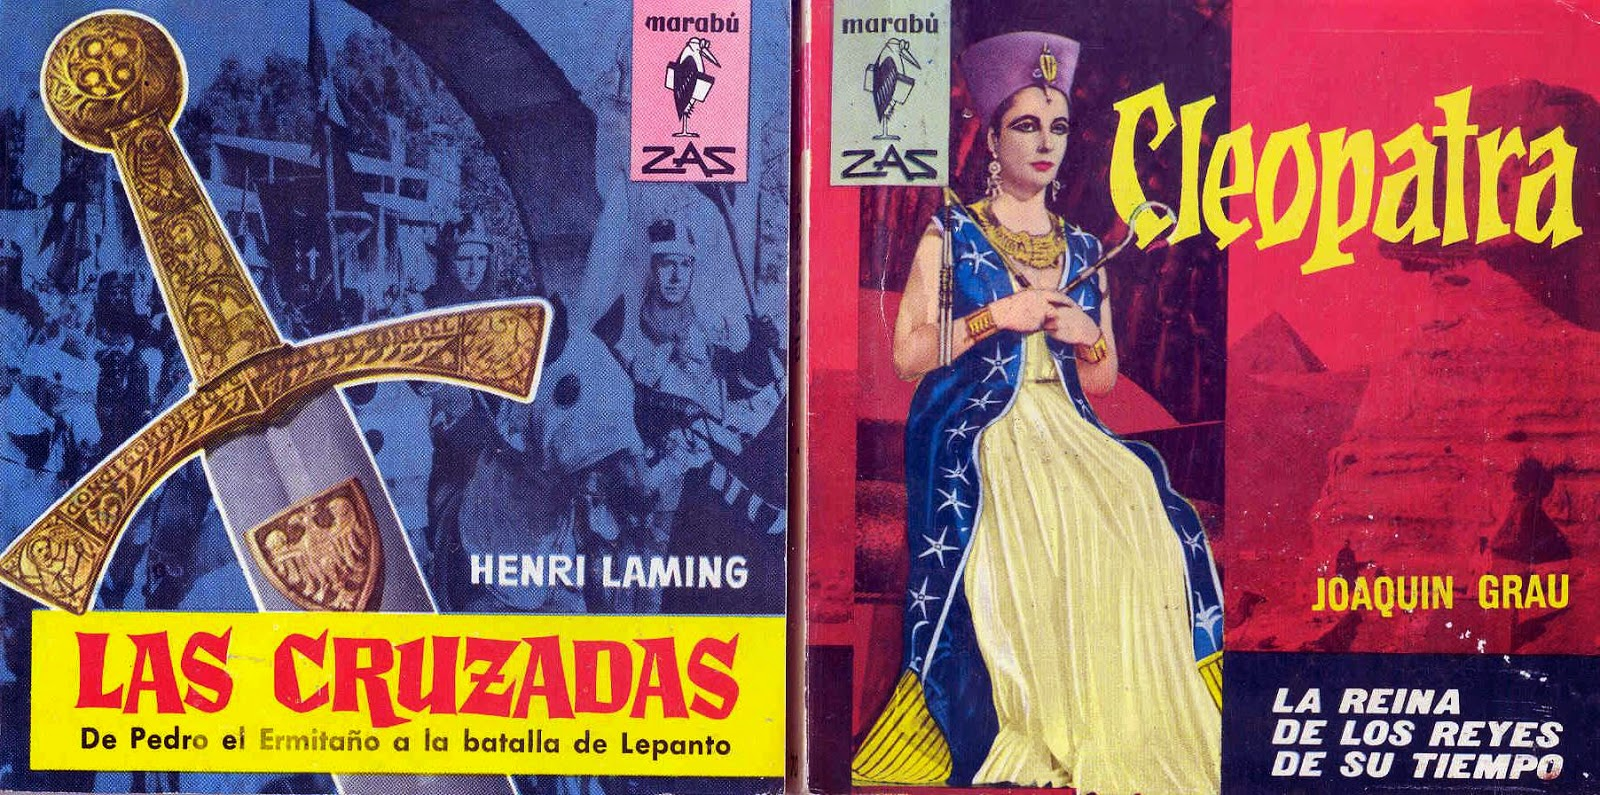 cruzadas-laming-cleopatra-grau